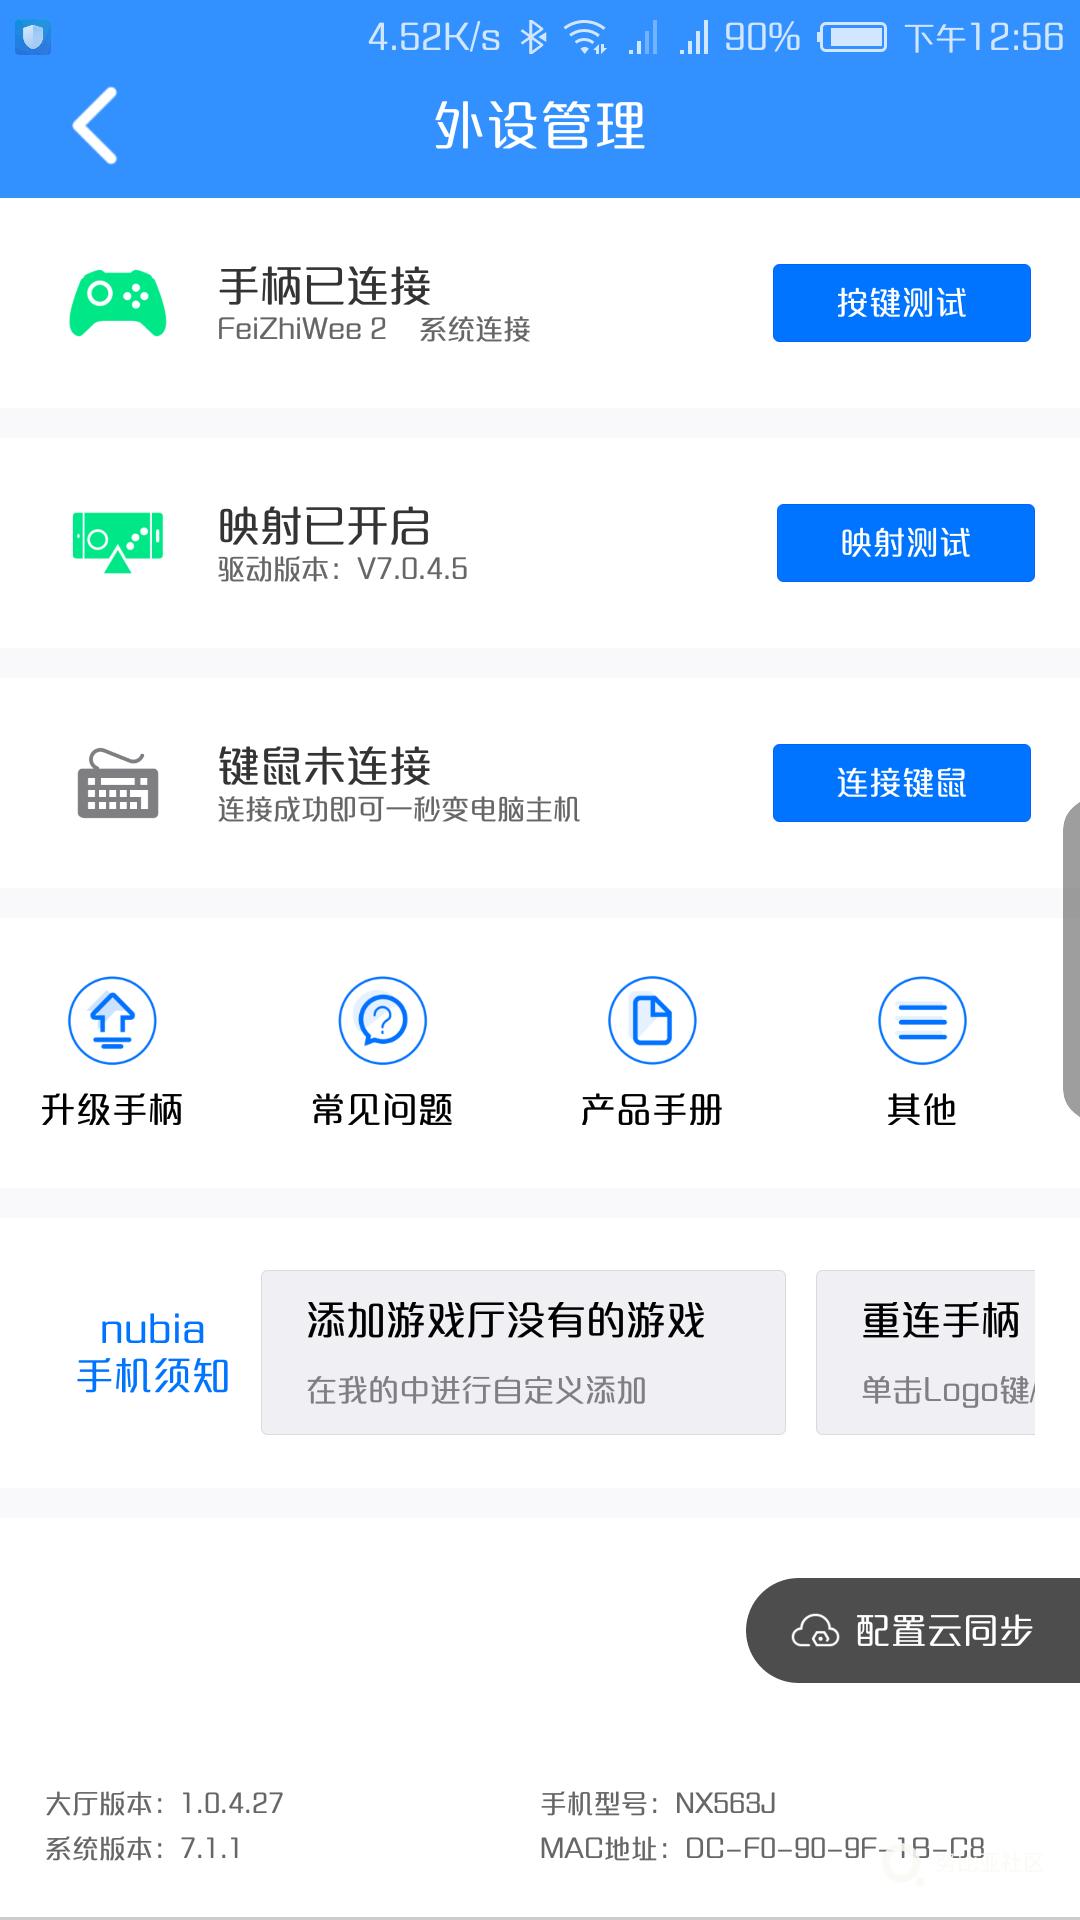 Screenshot_2018-06-09-12-56-38.png